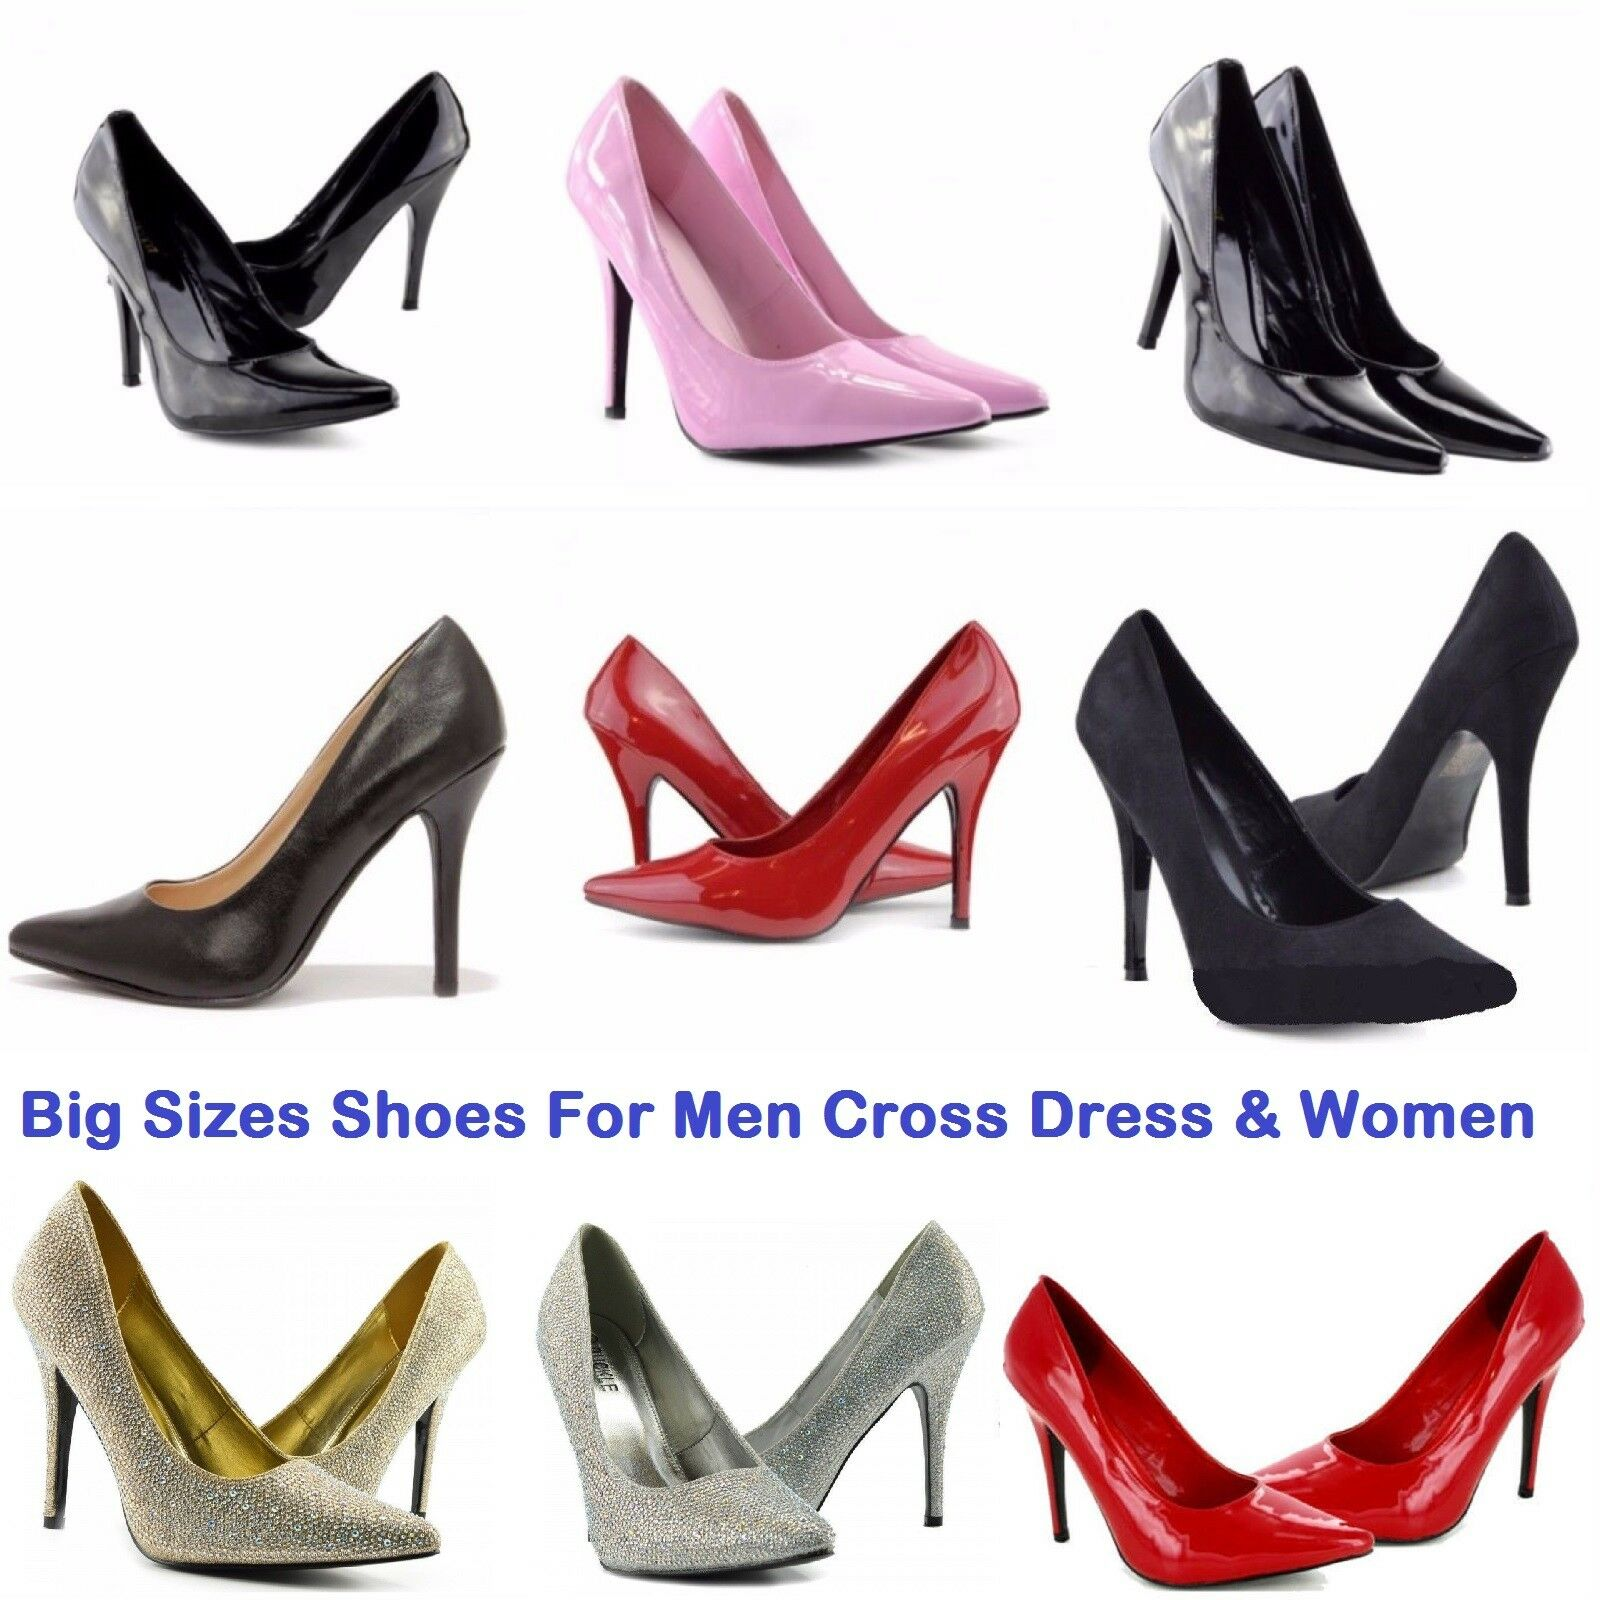 Big Size Cross Dresser Women Drag Queen Patent Leather High Heel Size 9-12 Shoes